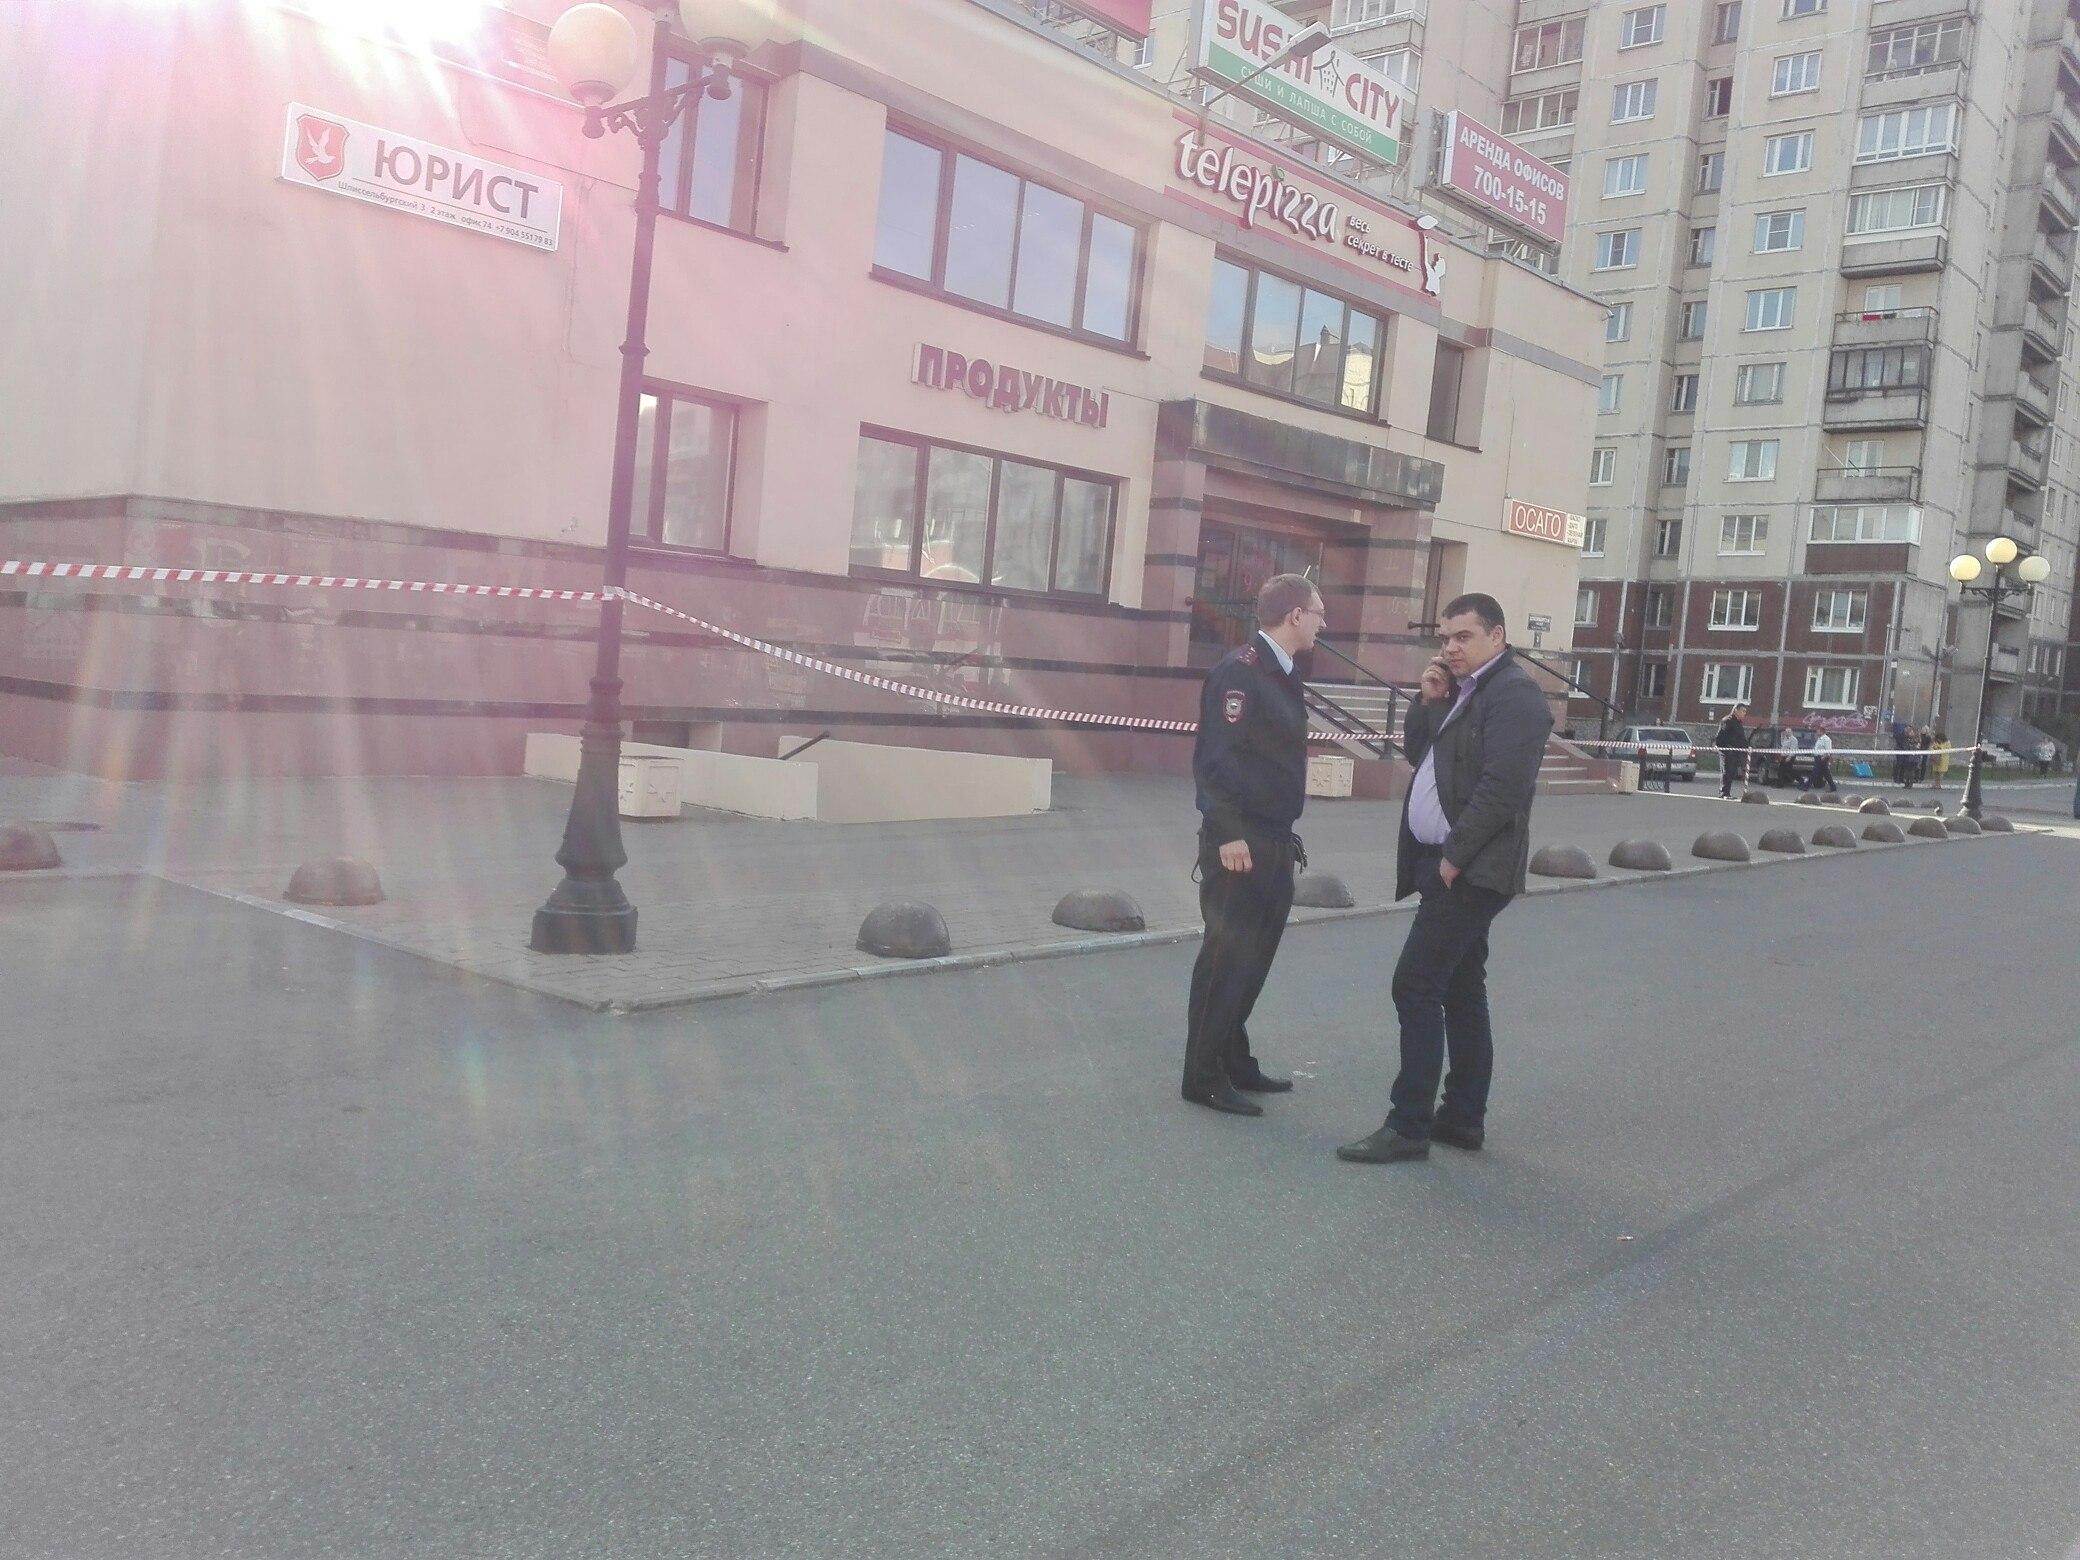 Фото: Елена Мухина (vk.com/mukhina68)